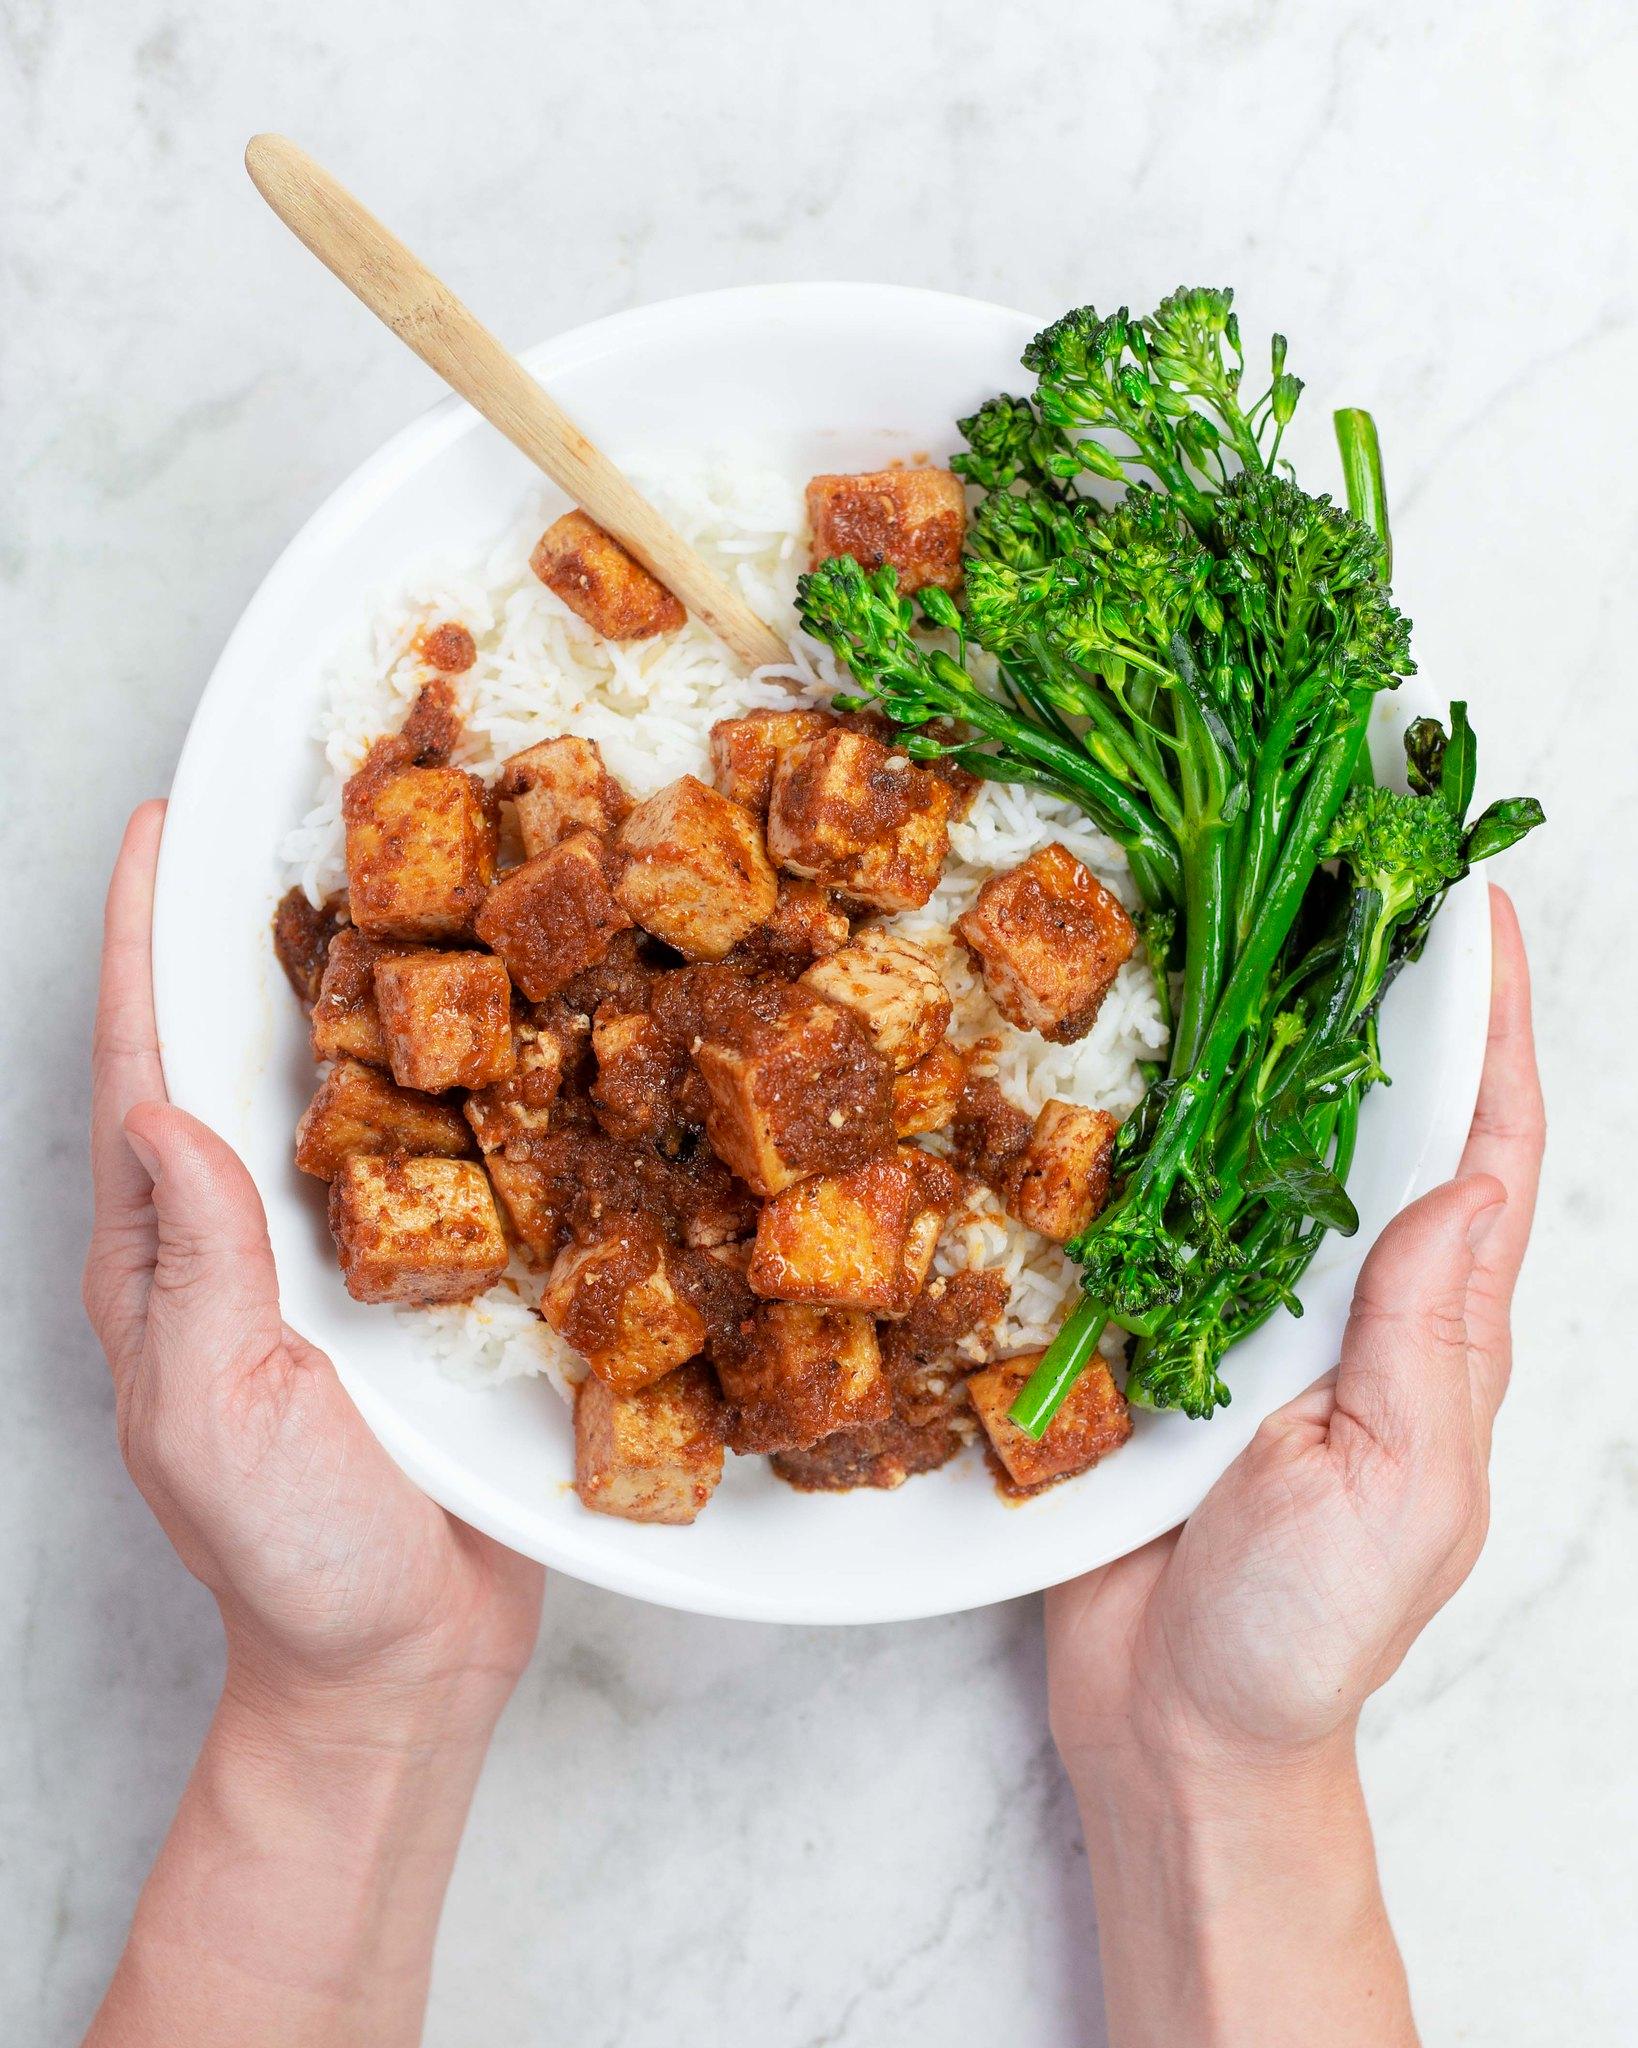 Mapo Tofu with Kimchi | Vegan Recipe with Kimchi